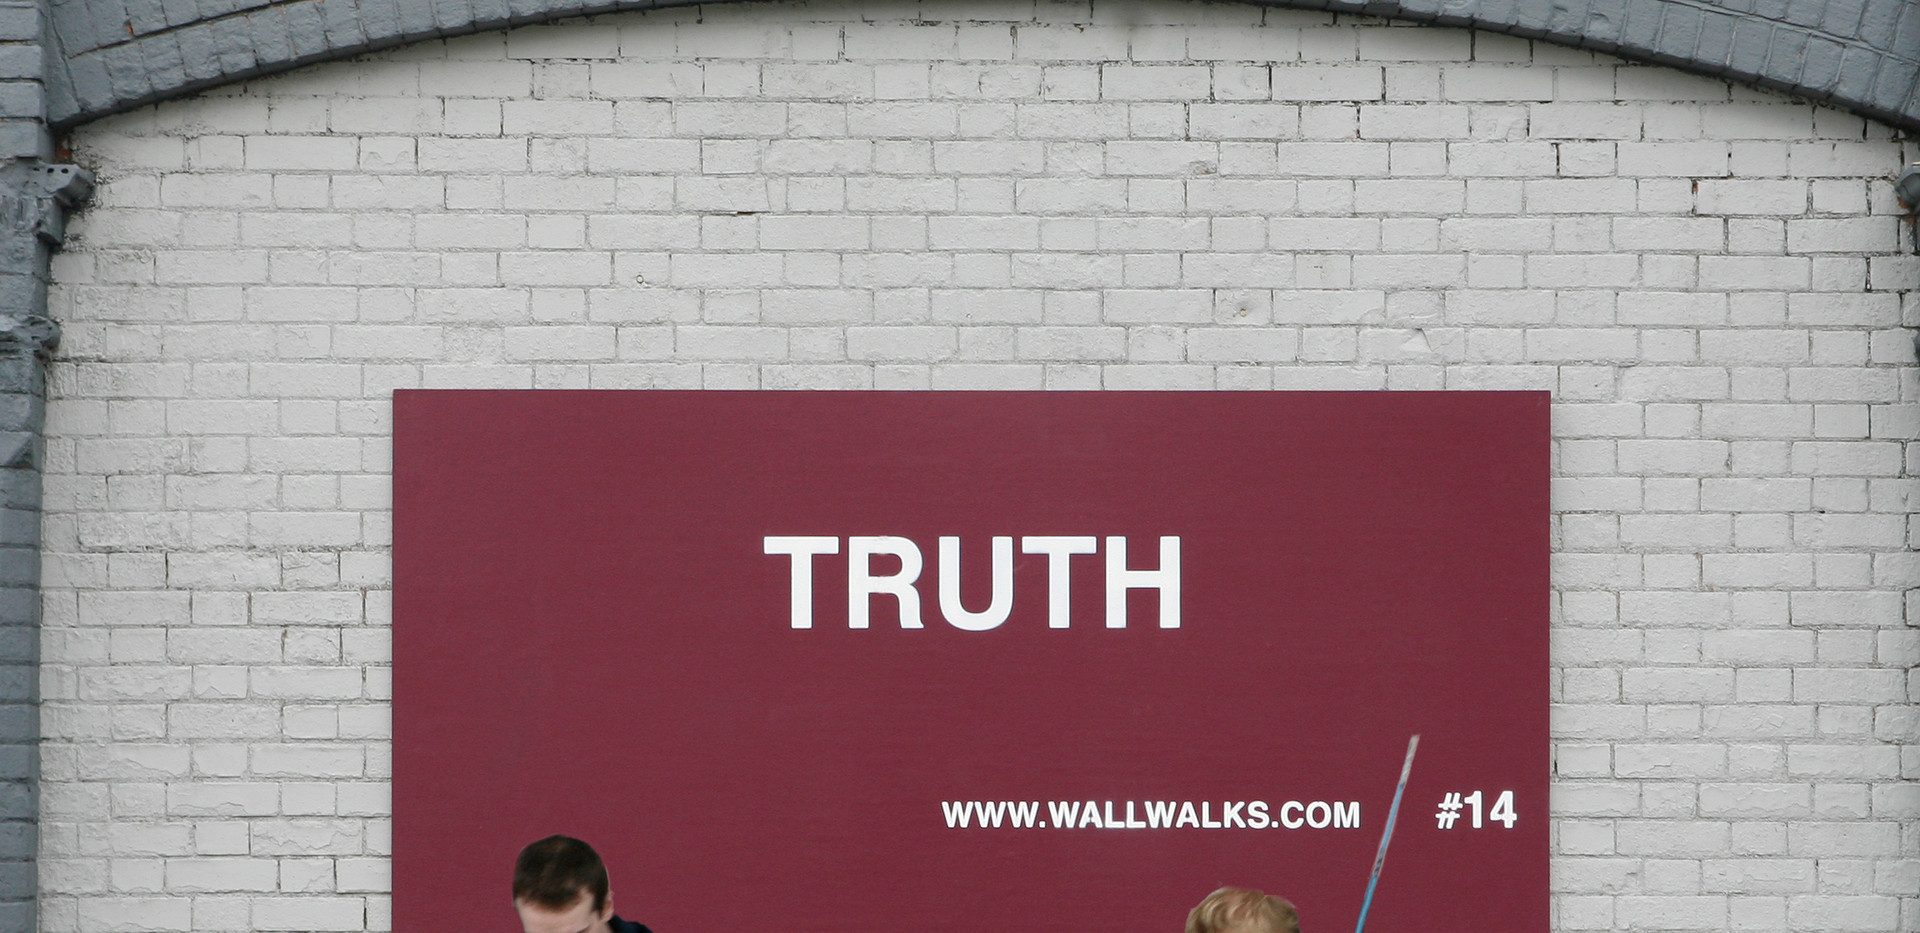 Wallwalks 3.JPG